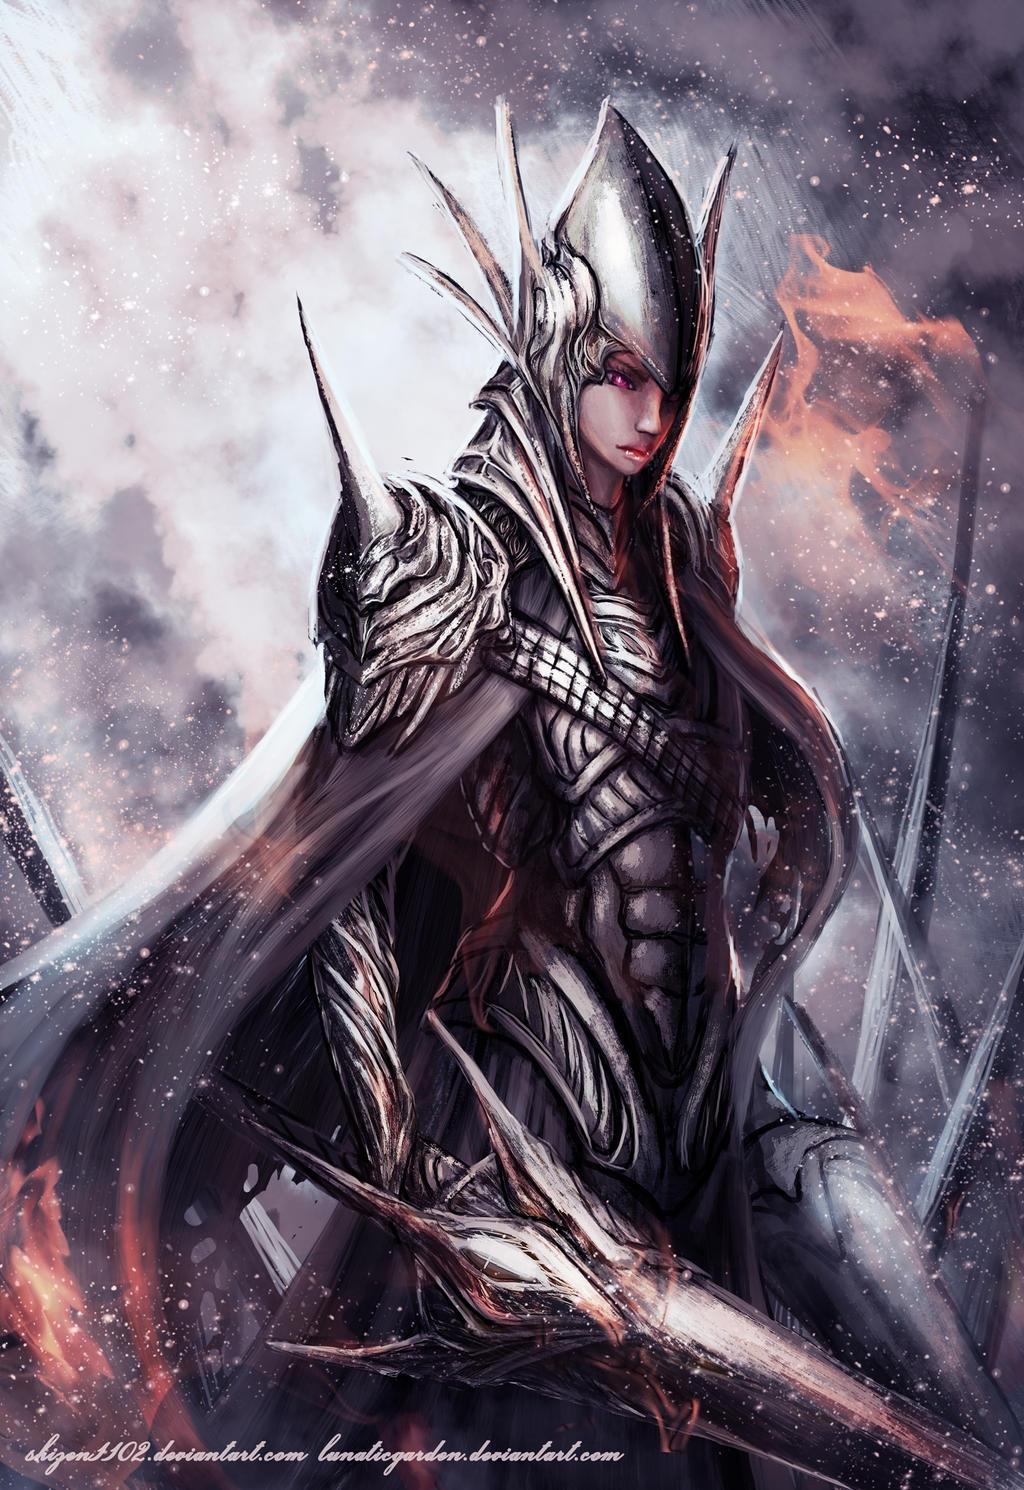 Dyaniel - Grand Master of the Knights Templar